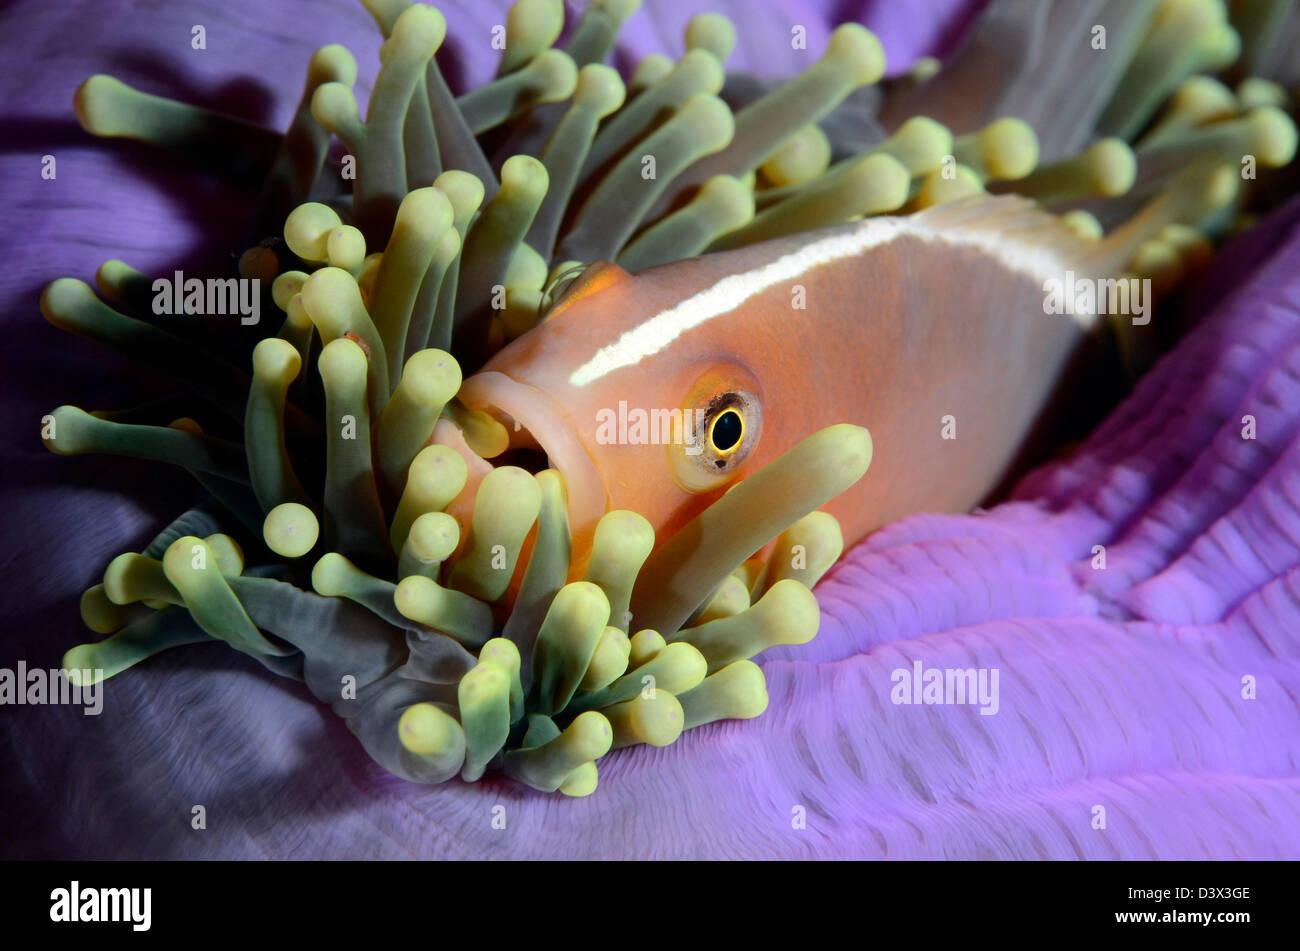 Poisson Clown Amphiprion sandaracinos, Skunk, îles Similan, Thaïlande Photo Stock